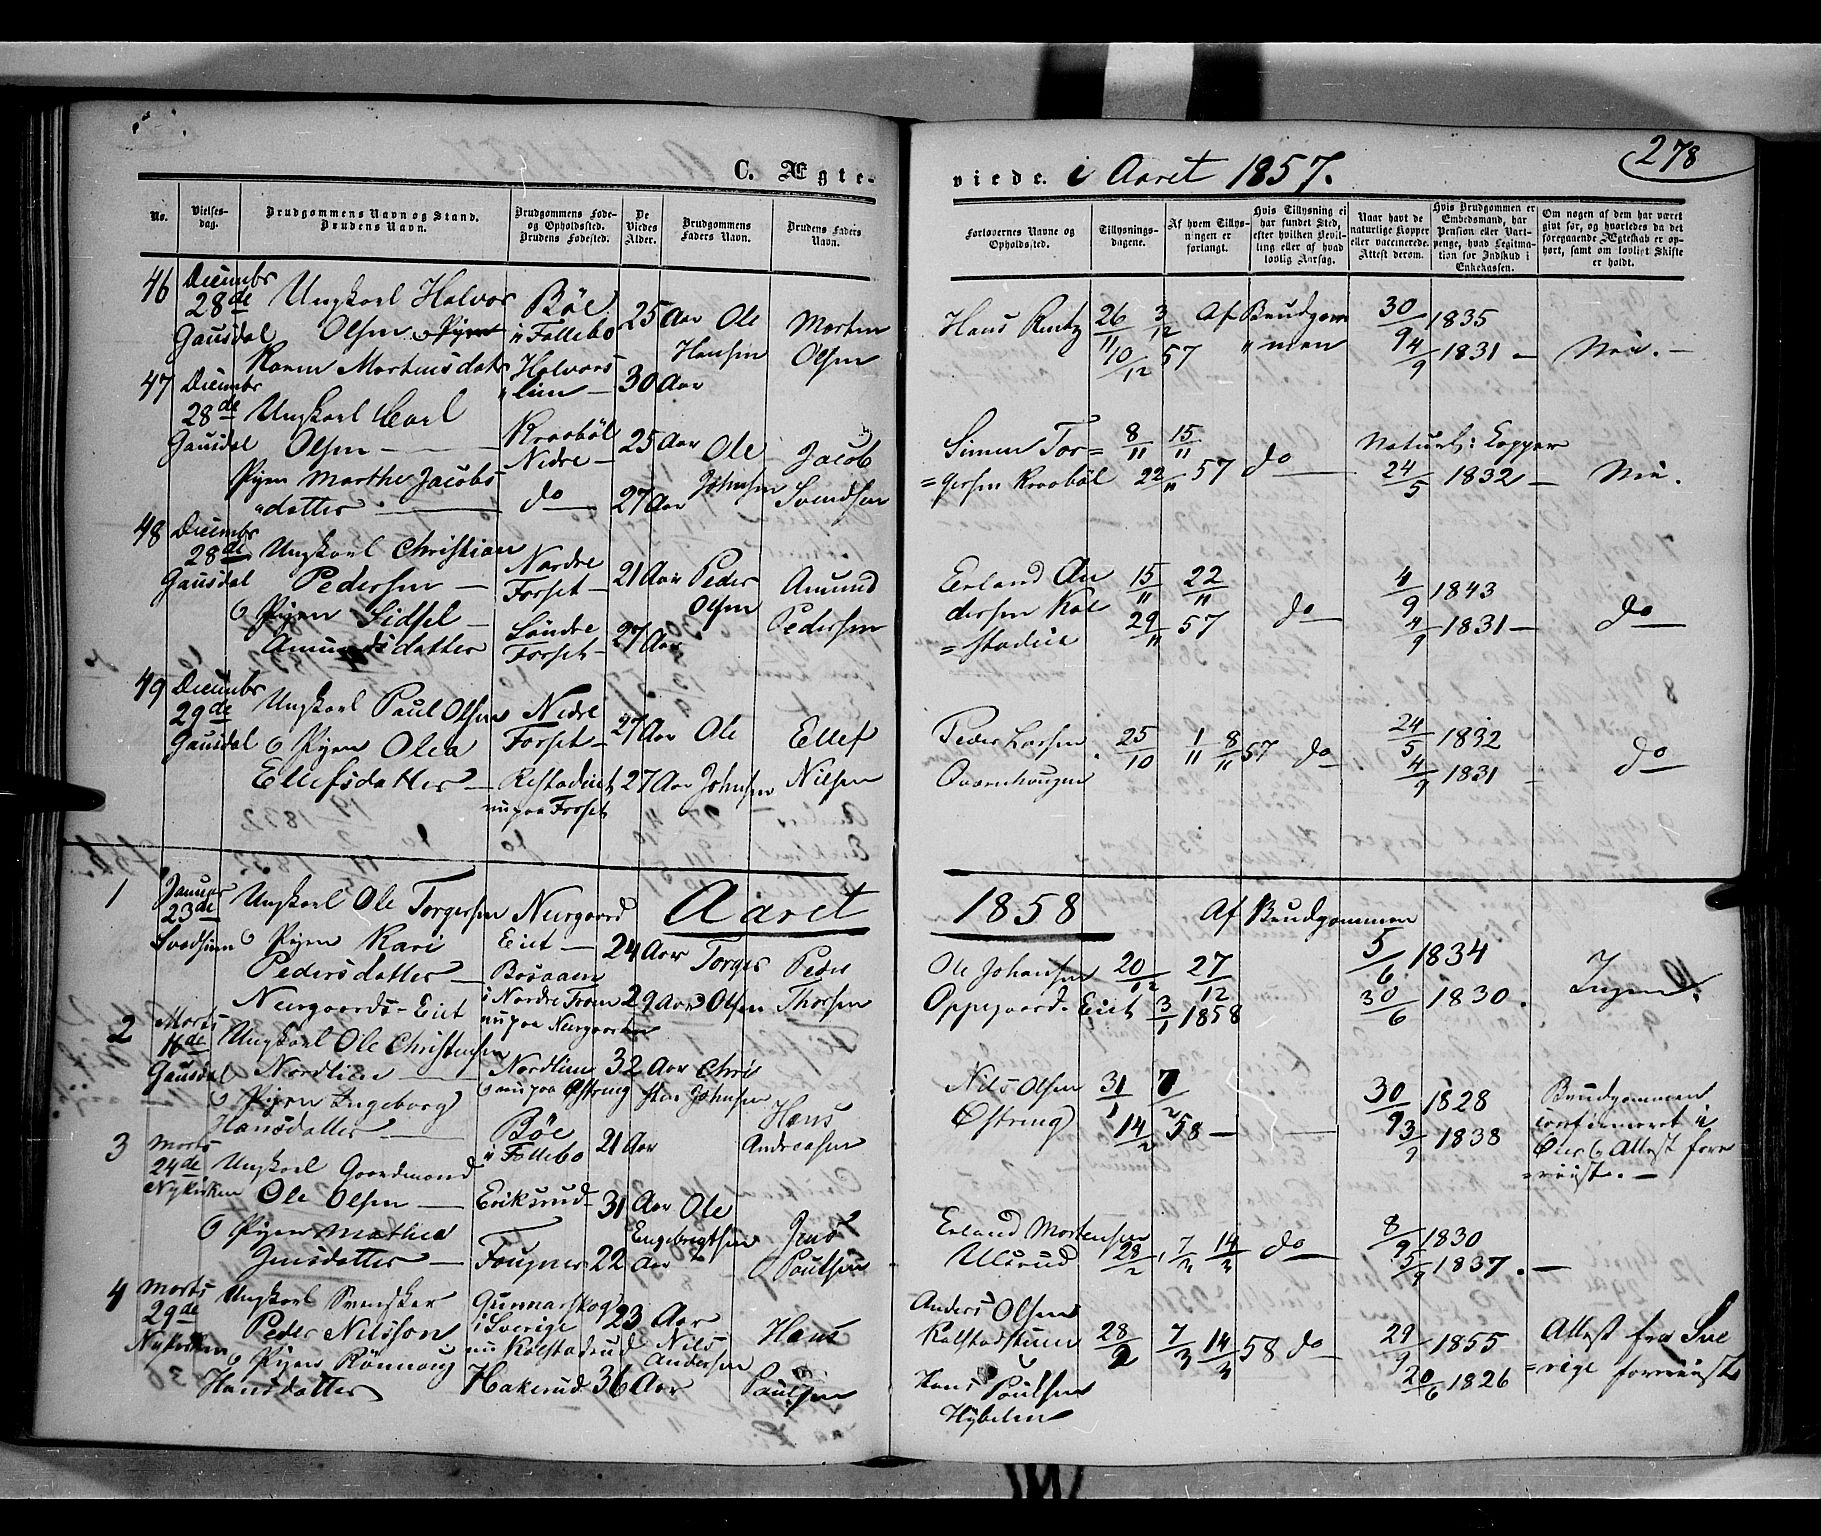 SAH, Gausdal prestekontor, Ministerialbok nr. 8, 1850-1861, s. 278